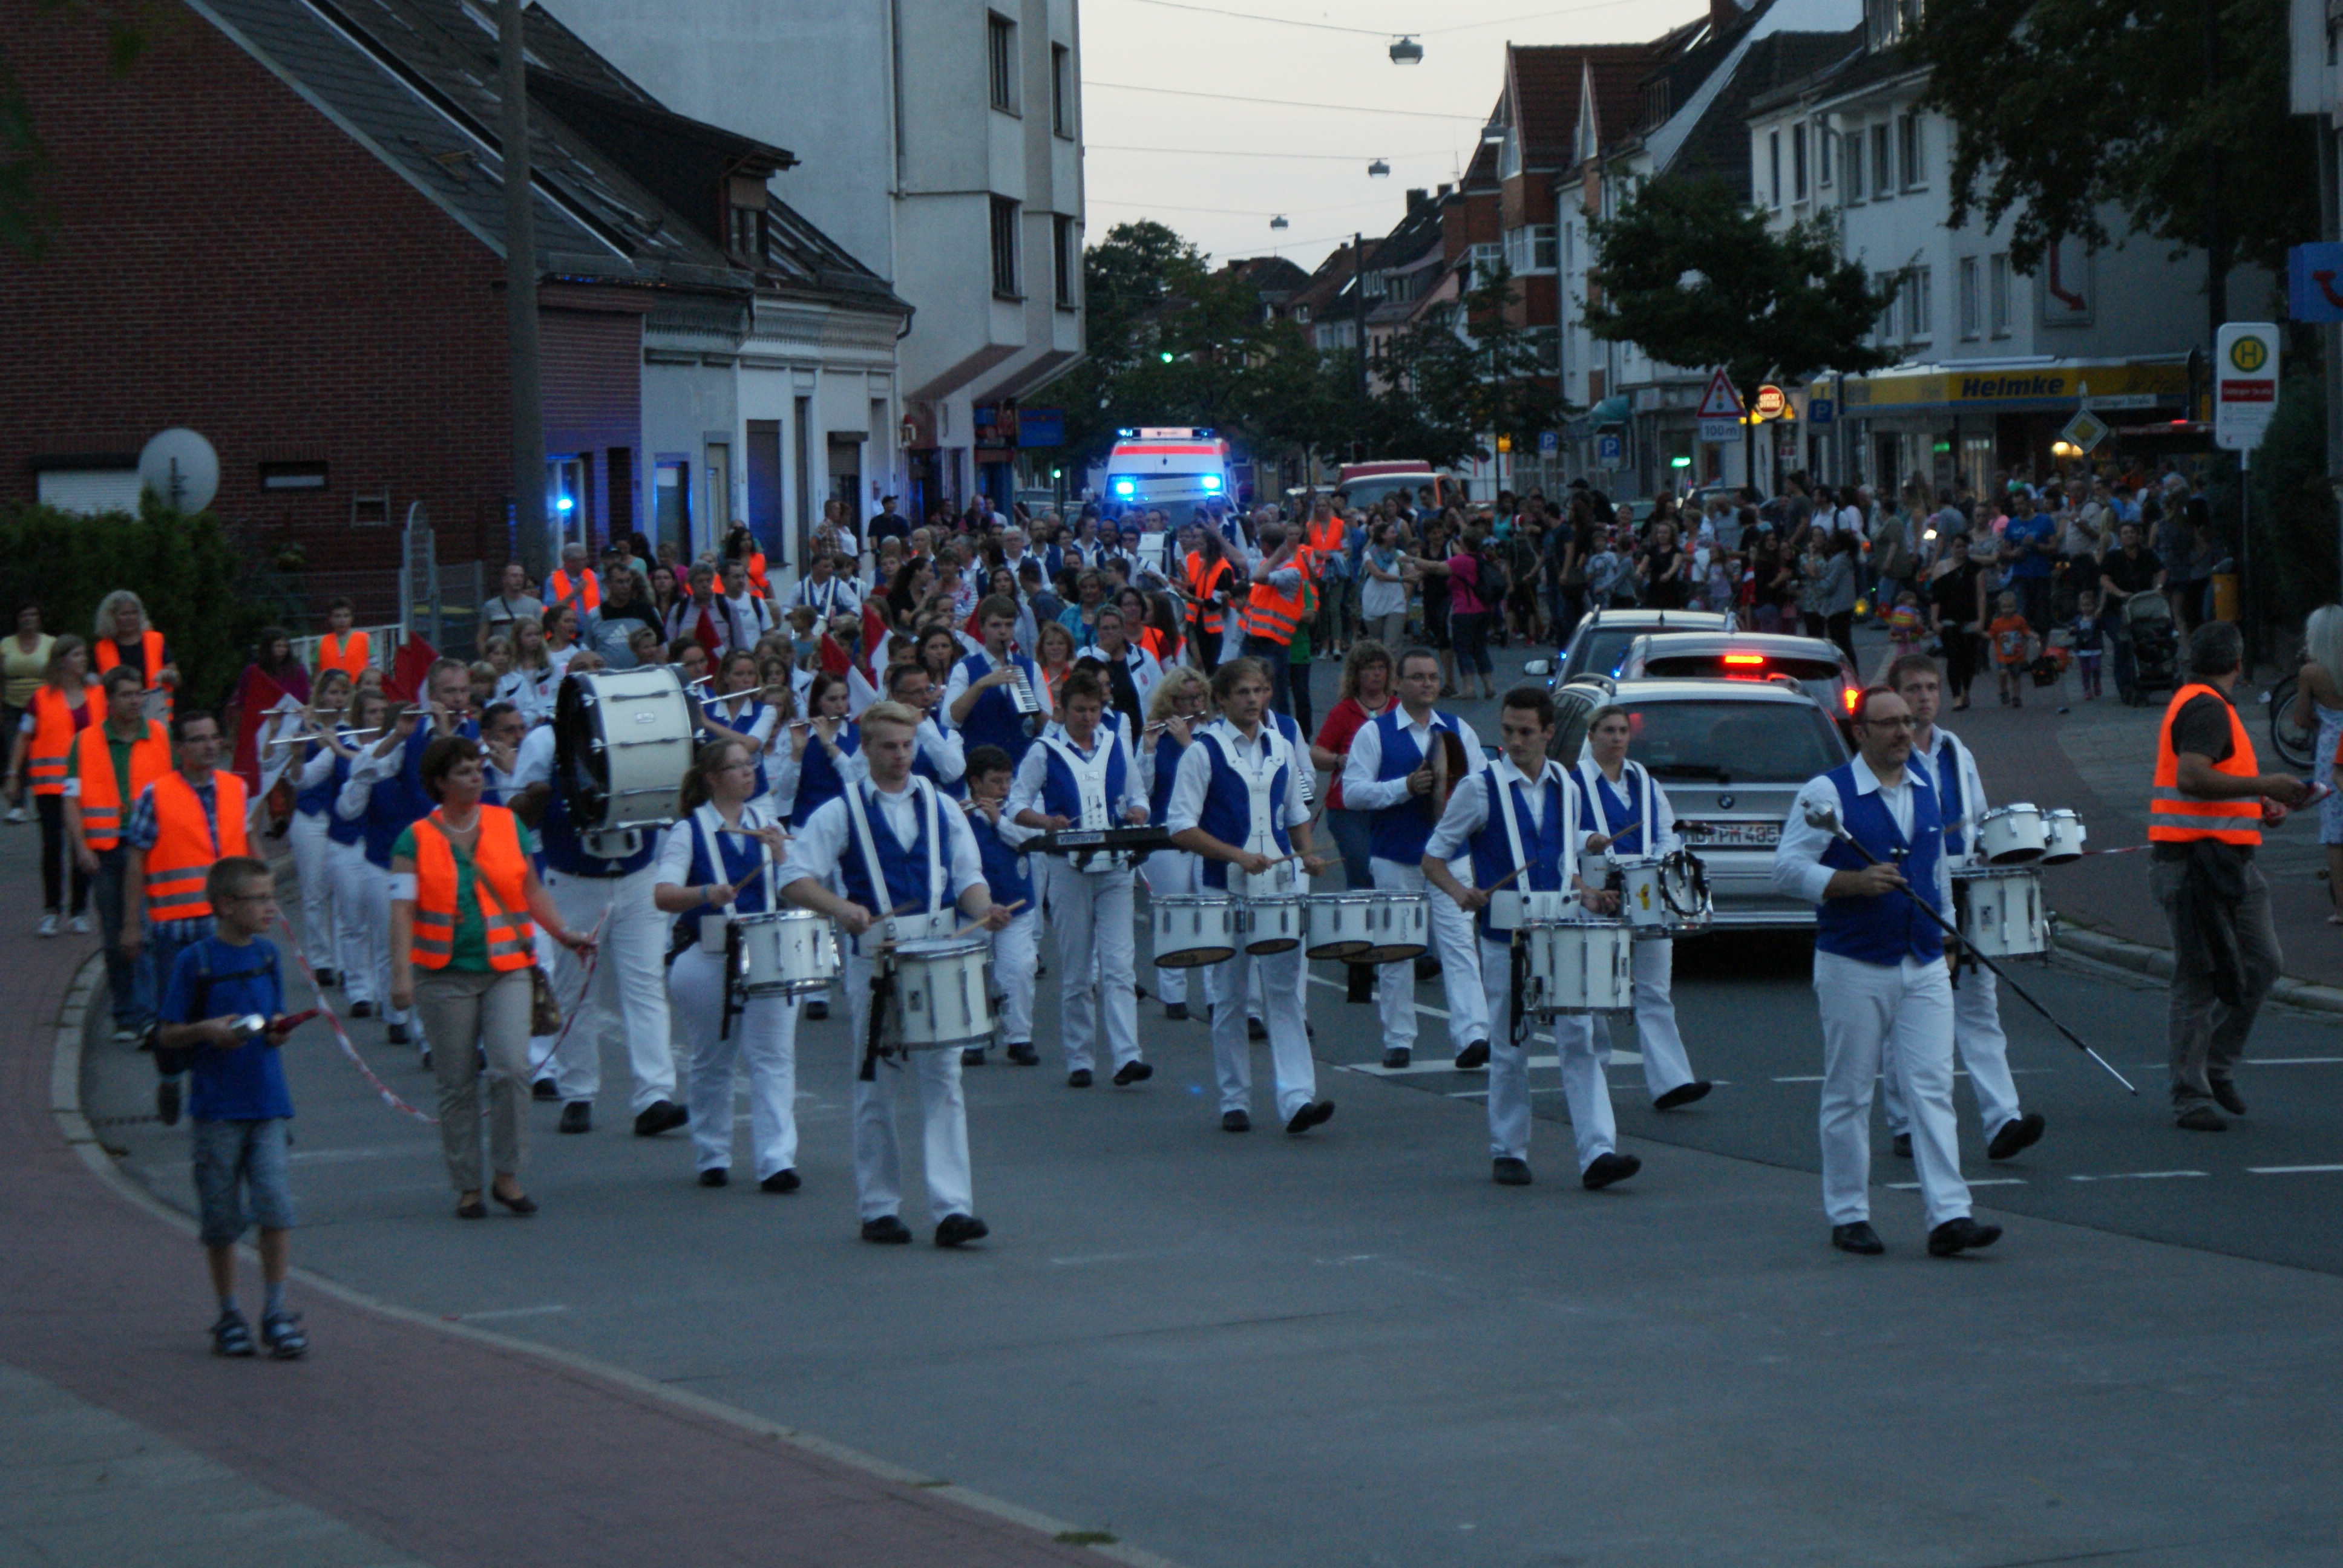 Laternenumzug TS Woltmershausen